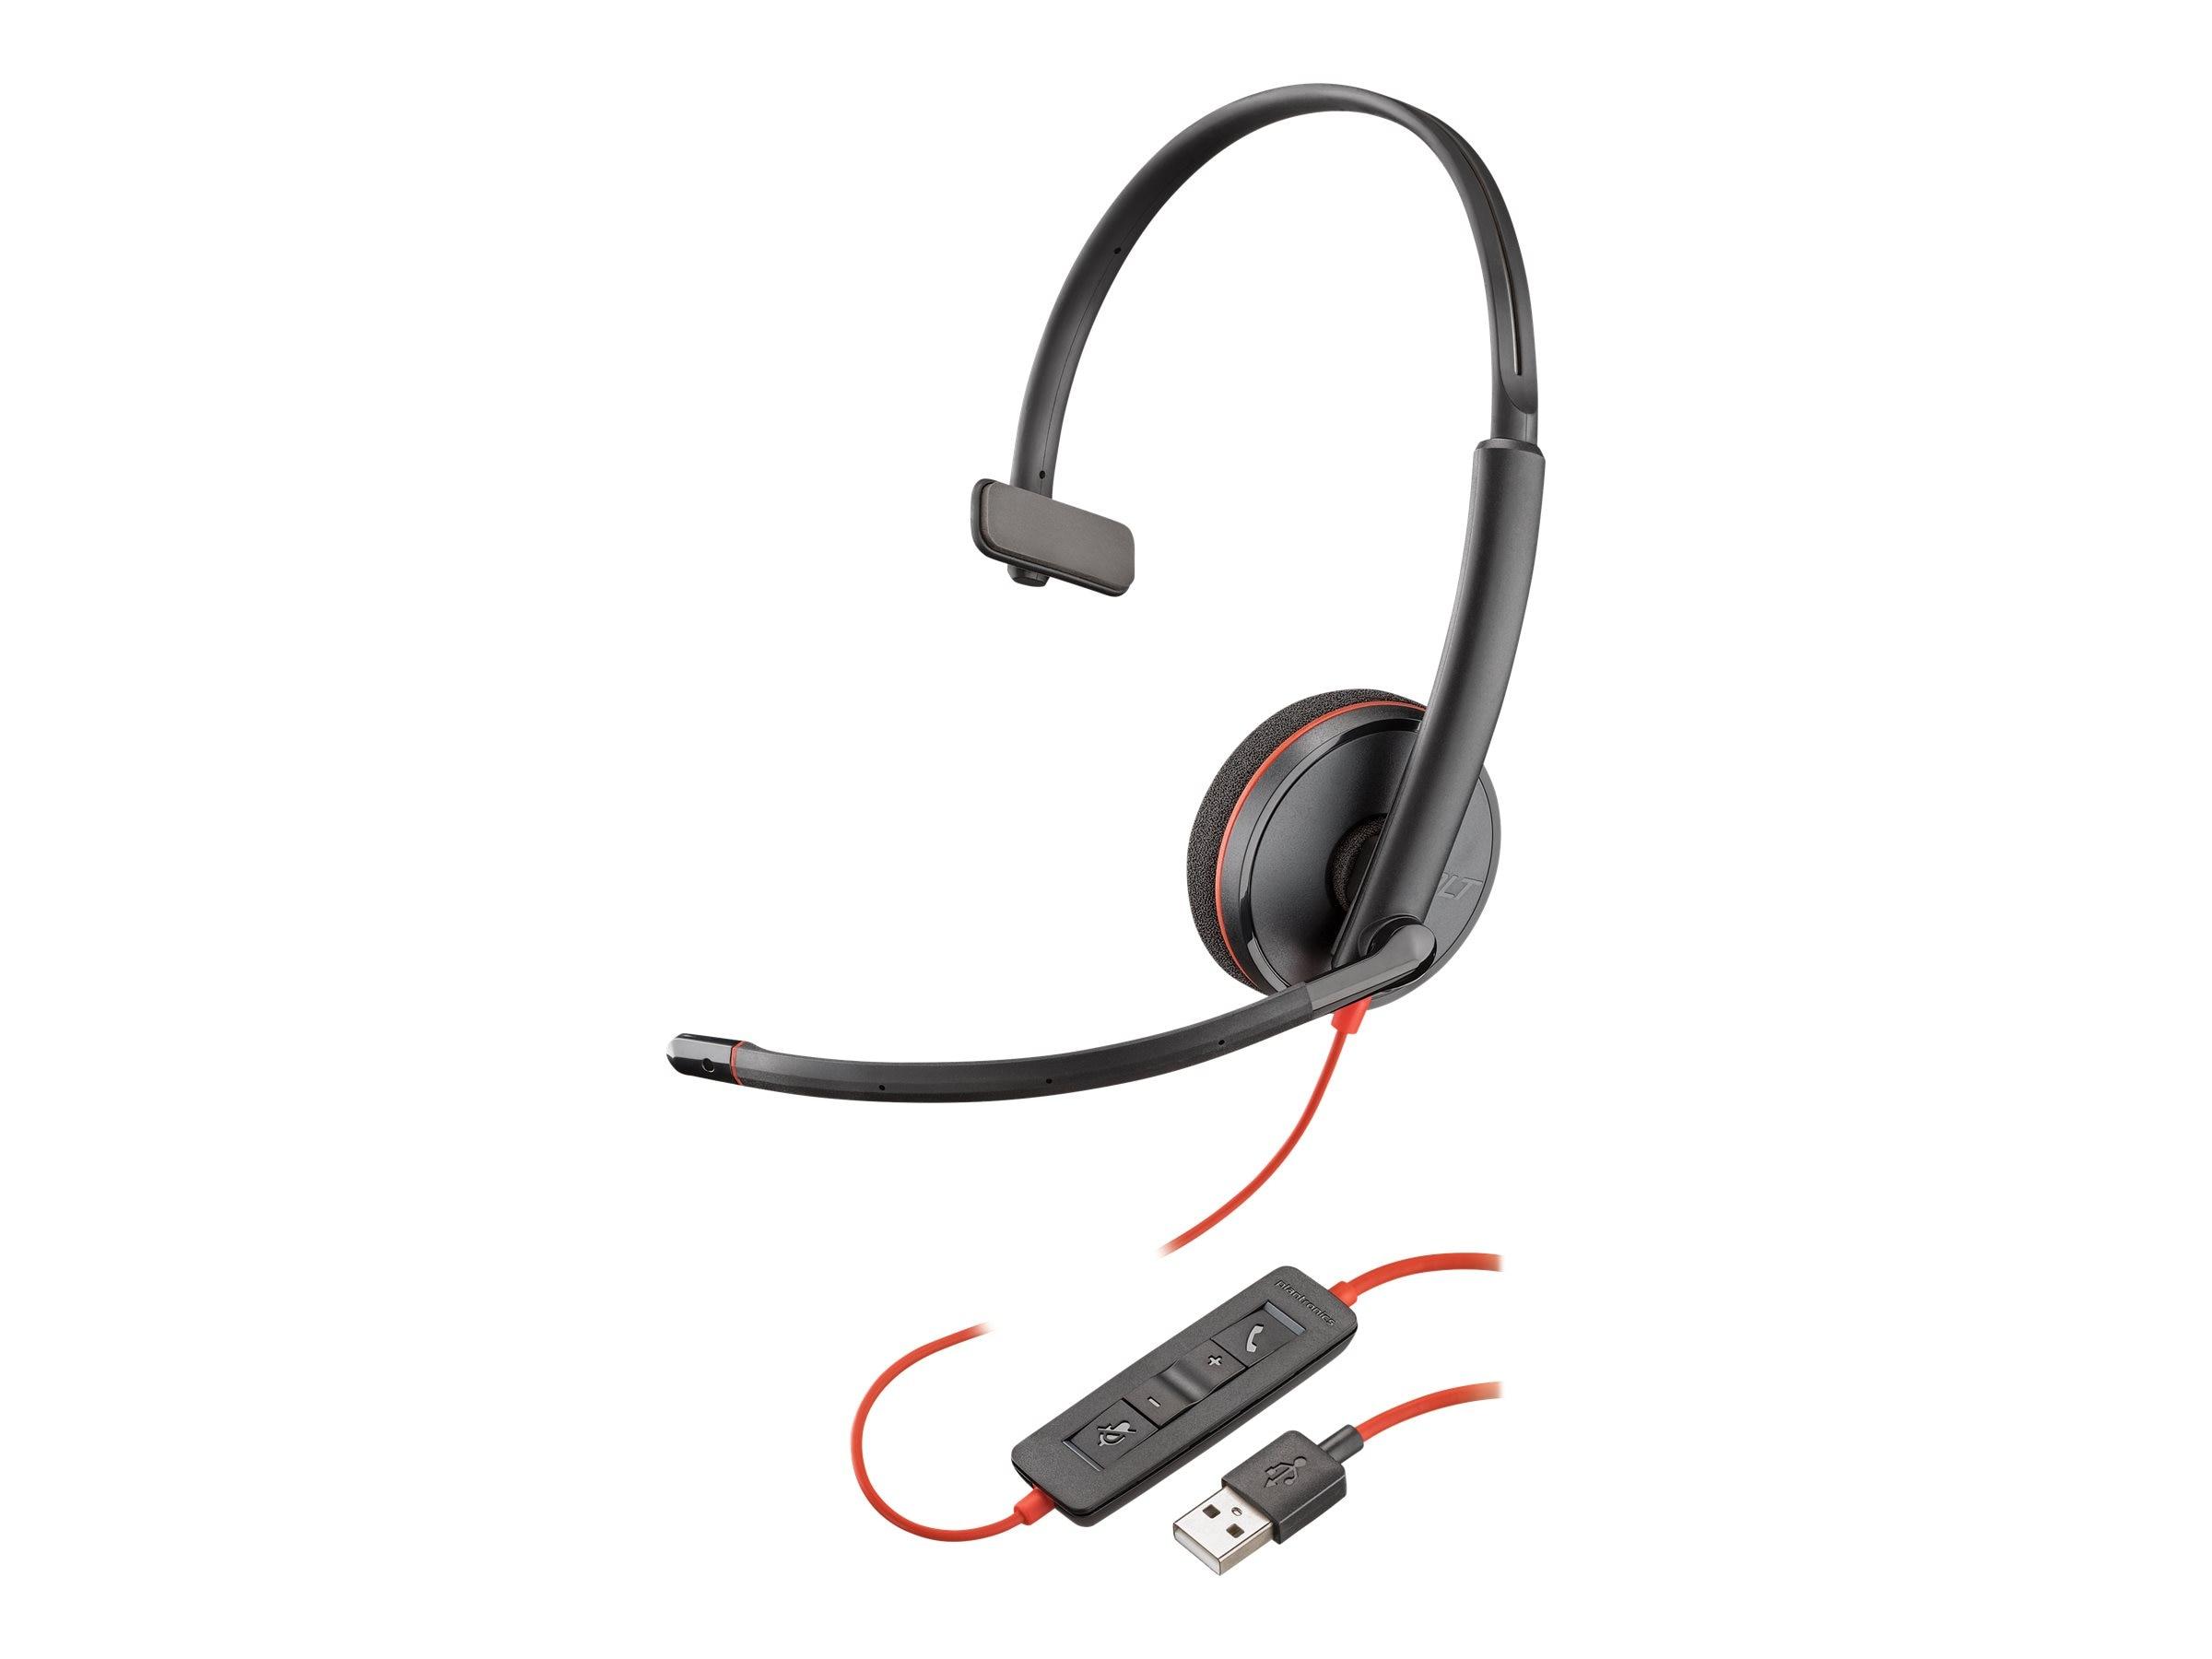 plantronics blackwire c3210 usb a headset Plantronics Headset Parts